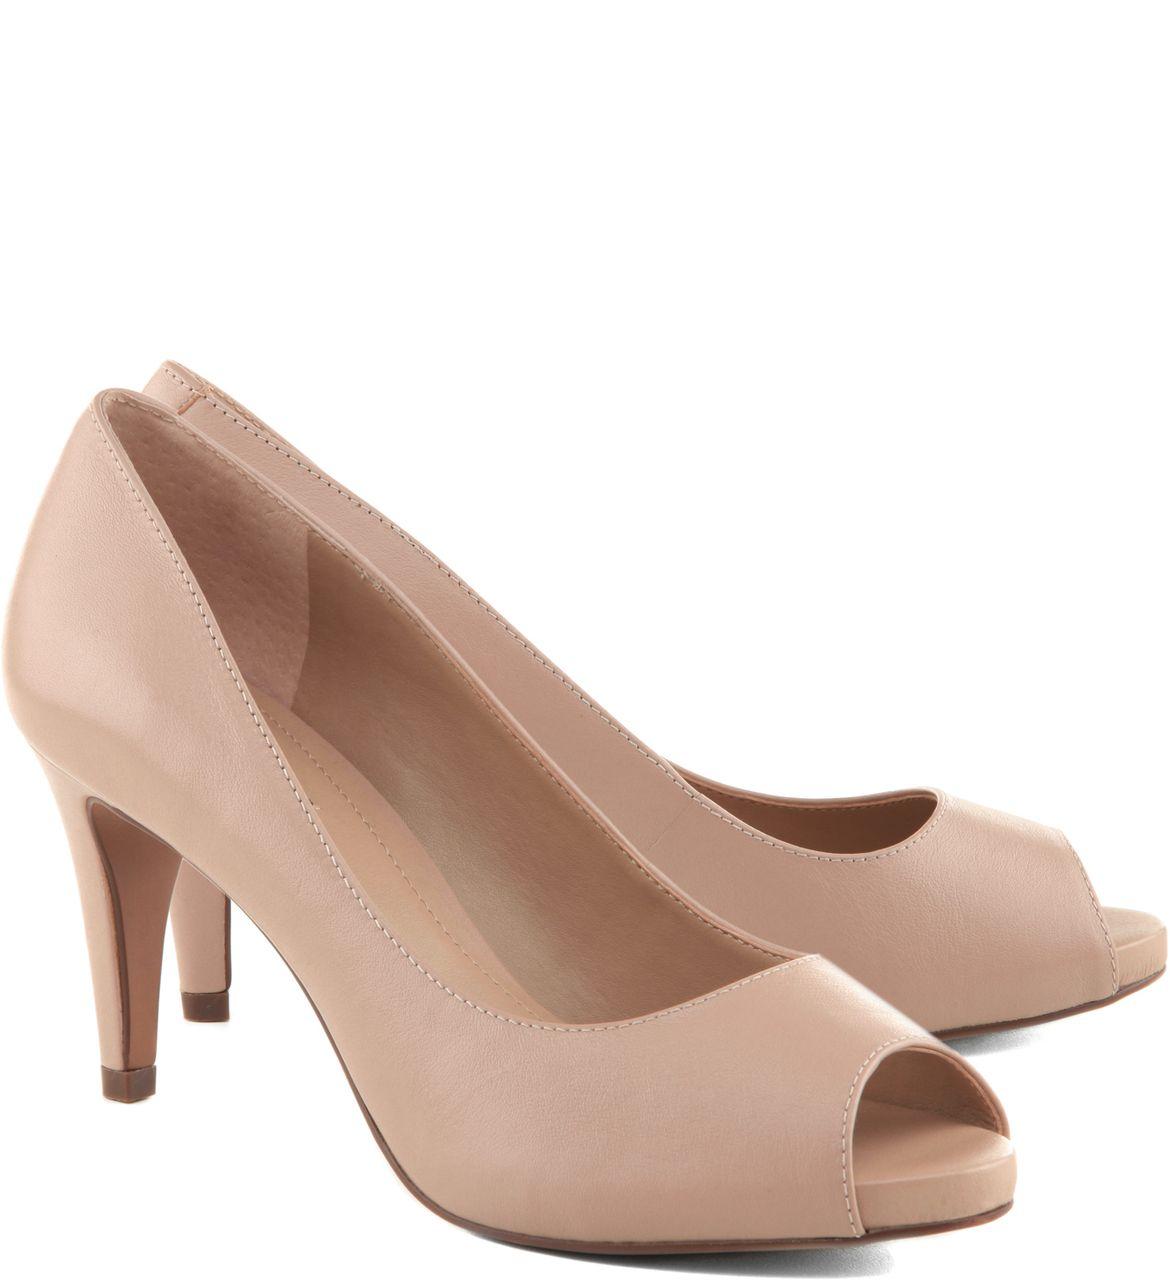 0a1285041 Peep Toe Classic Médio Street Rose in 2019 | shoes | Sapatos ...